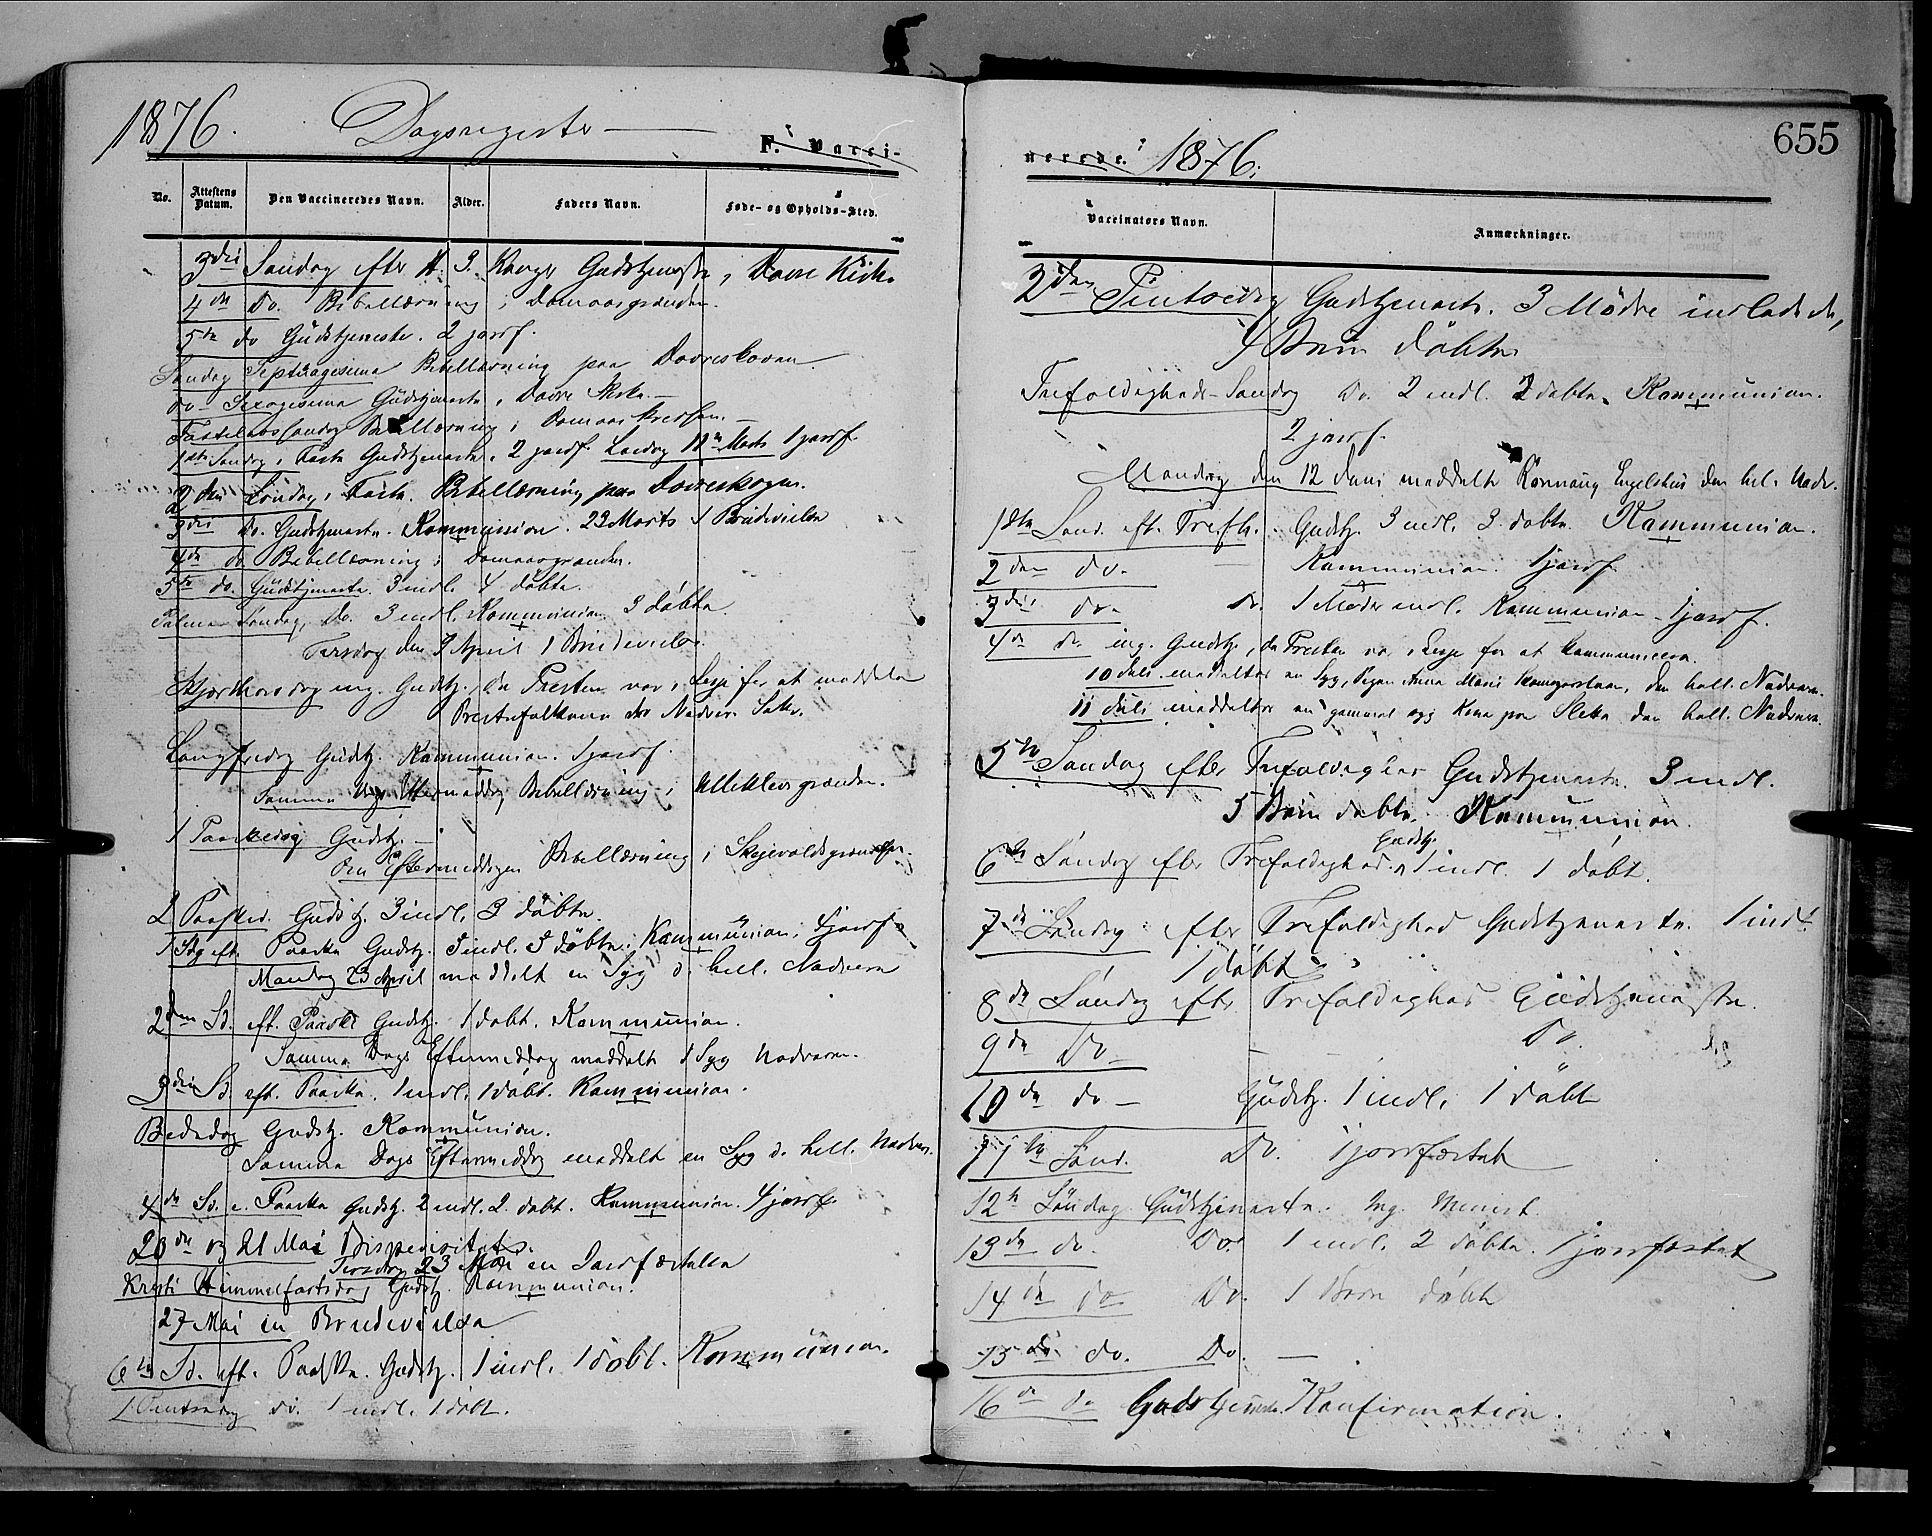 SAH, Dovre prestekontor, Ministerialbok nr. 1, 1854-1878, s. 655